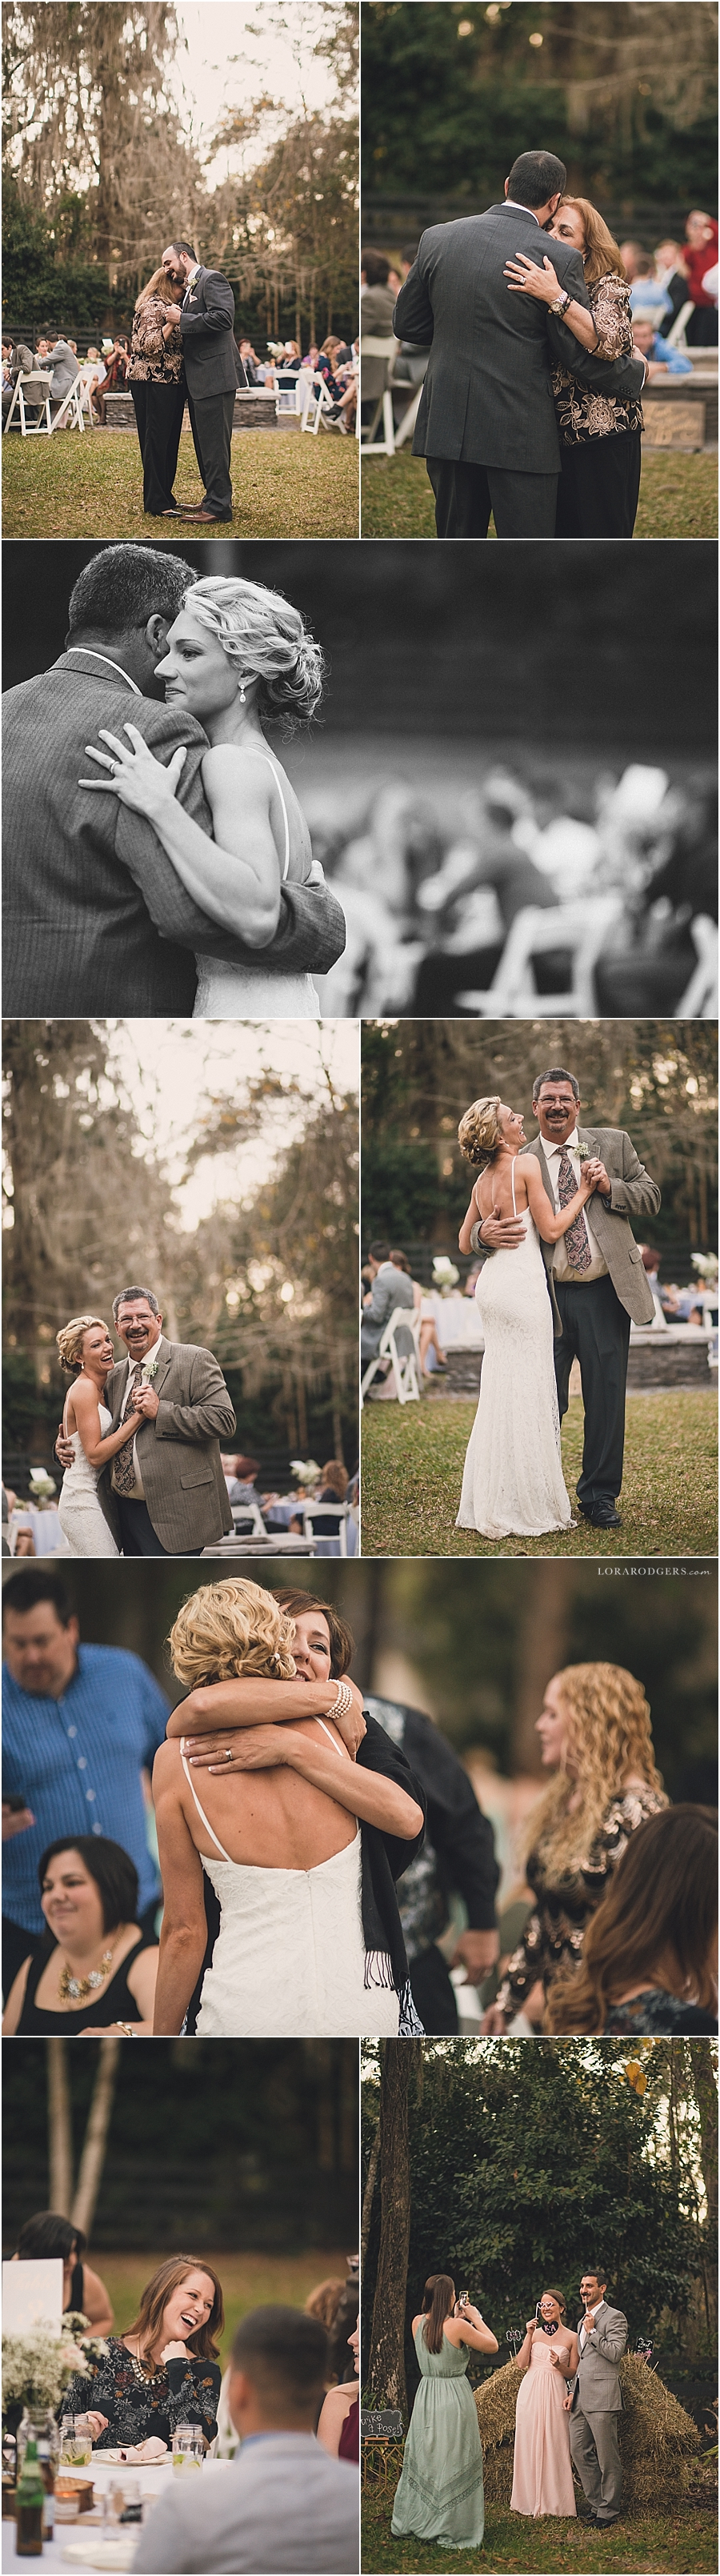 Country_Chic_Ocala_Wedding_018